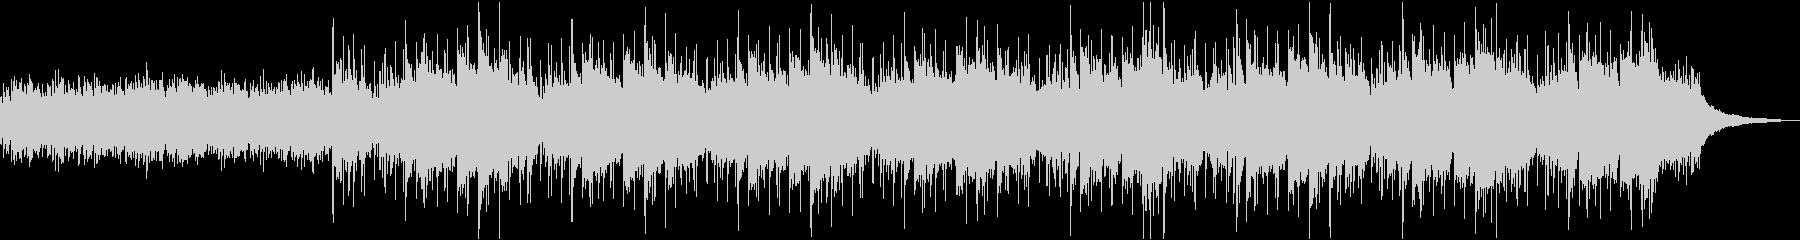 Acoustic Suspenseの未再生の波形